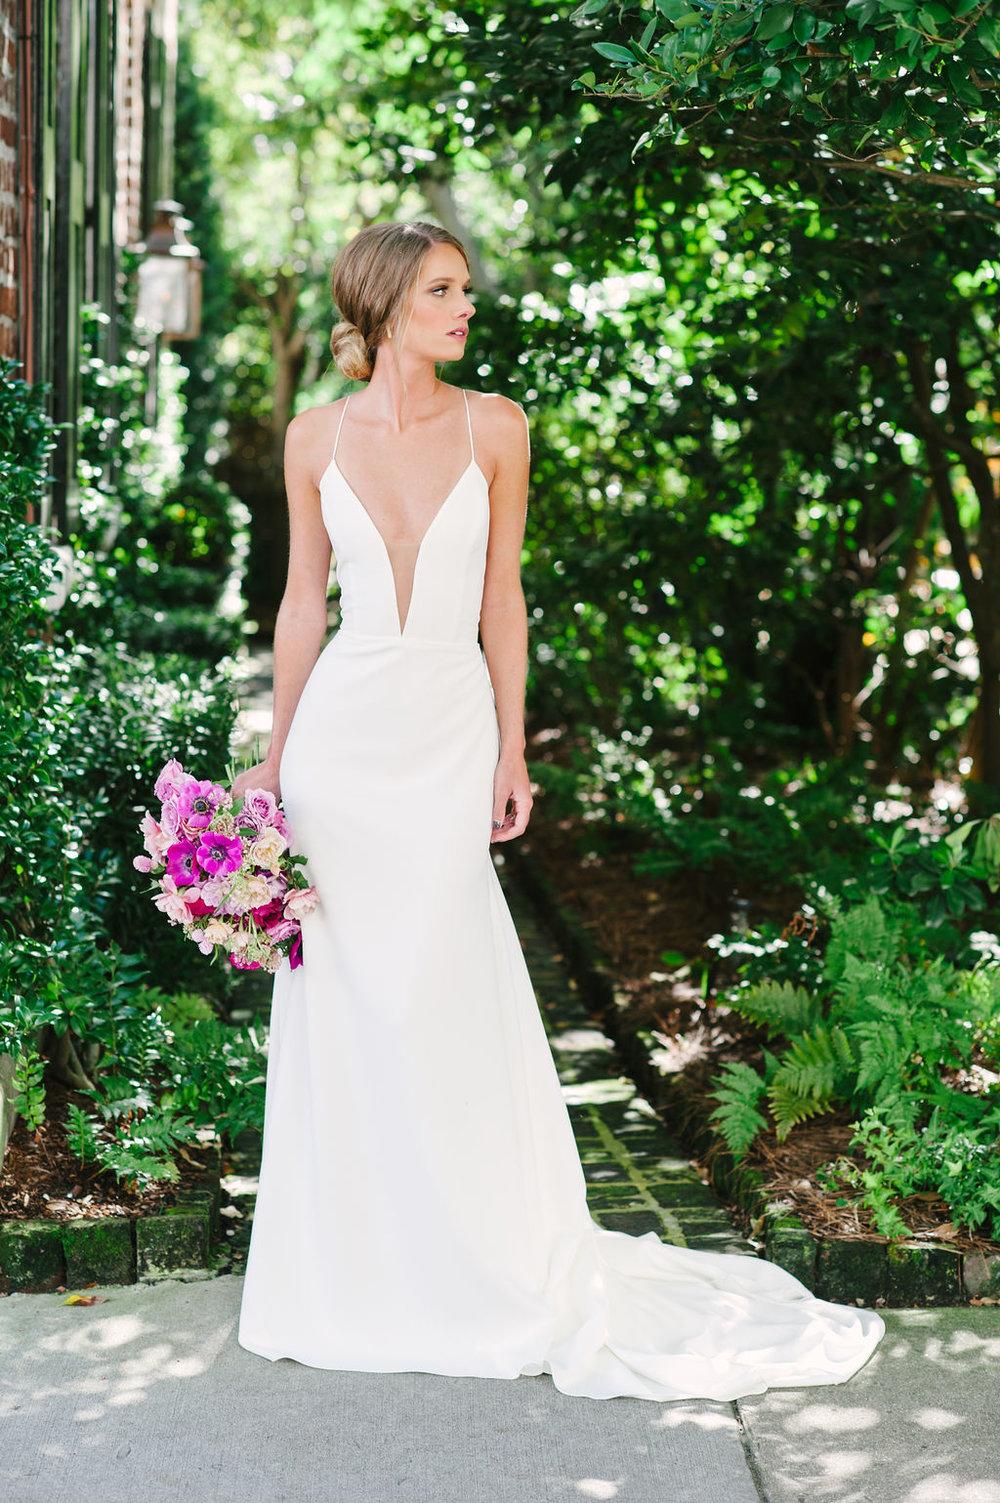 charleston-styled-elopement-17.jpg